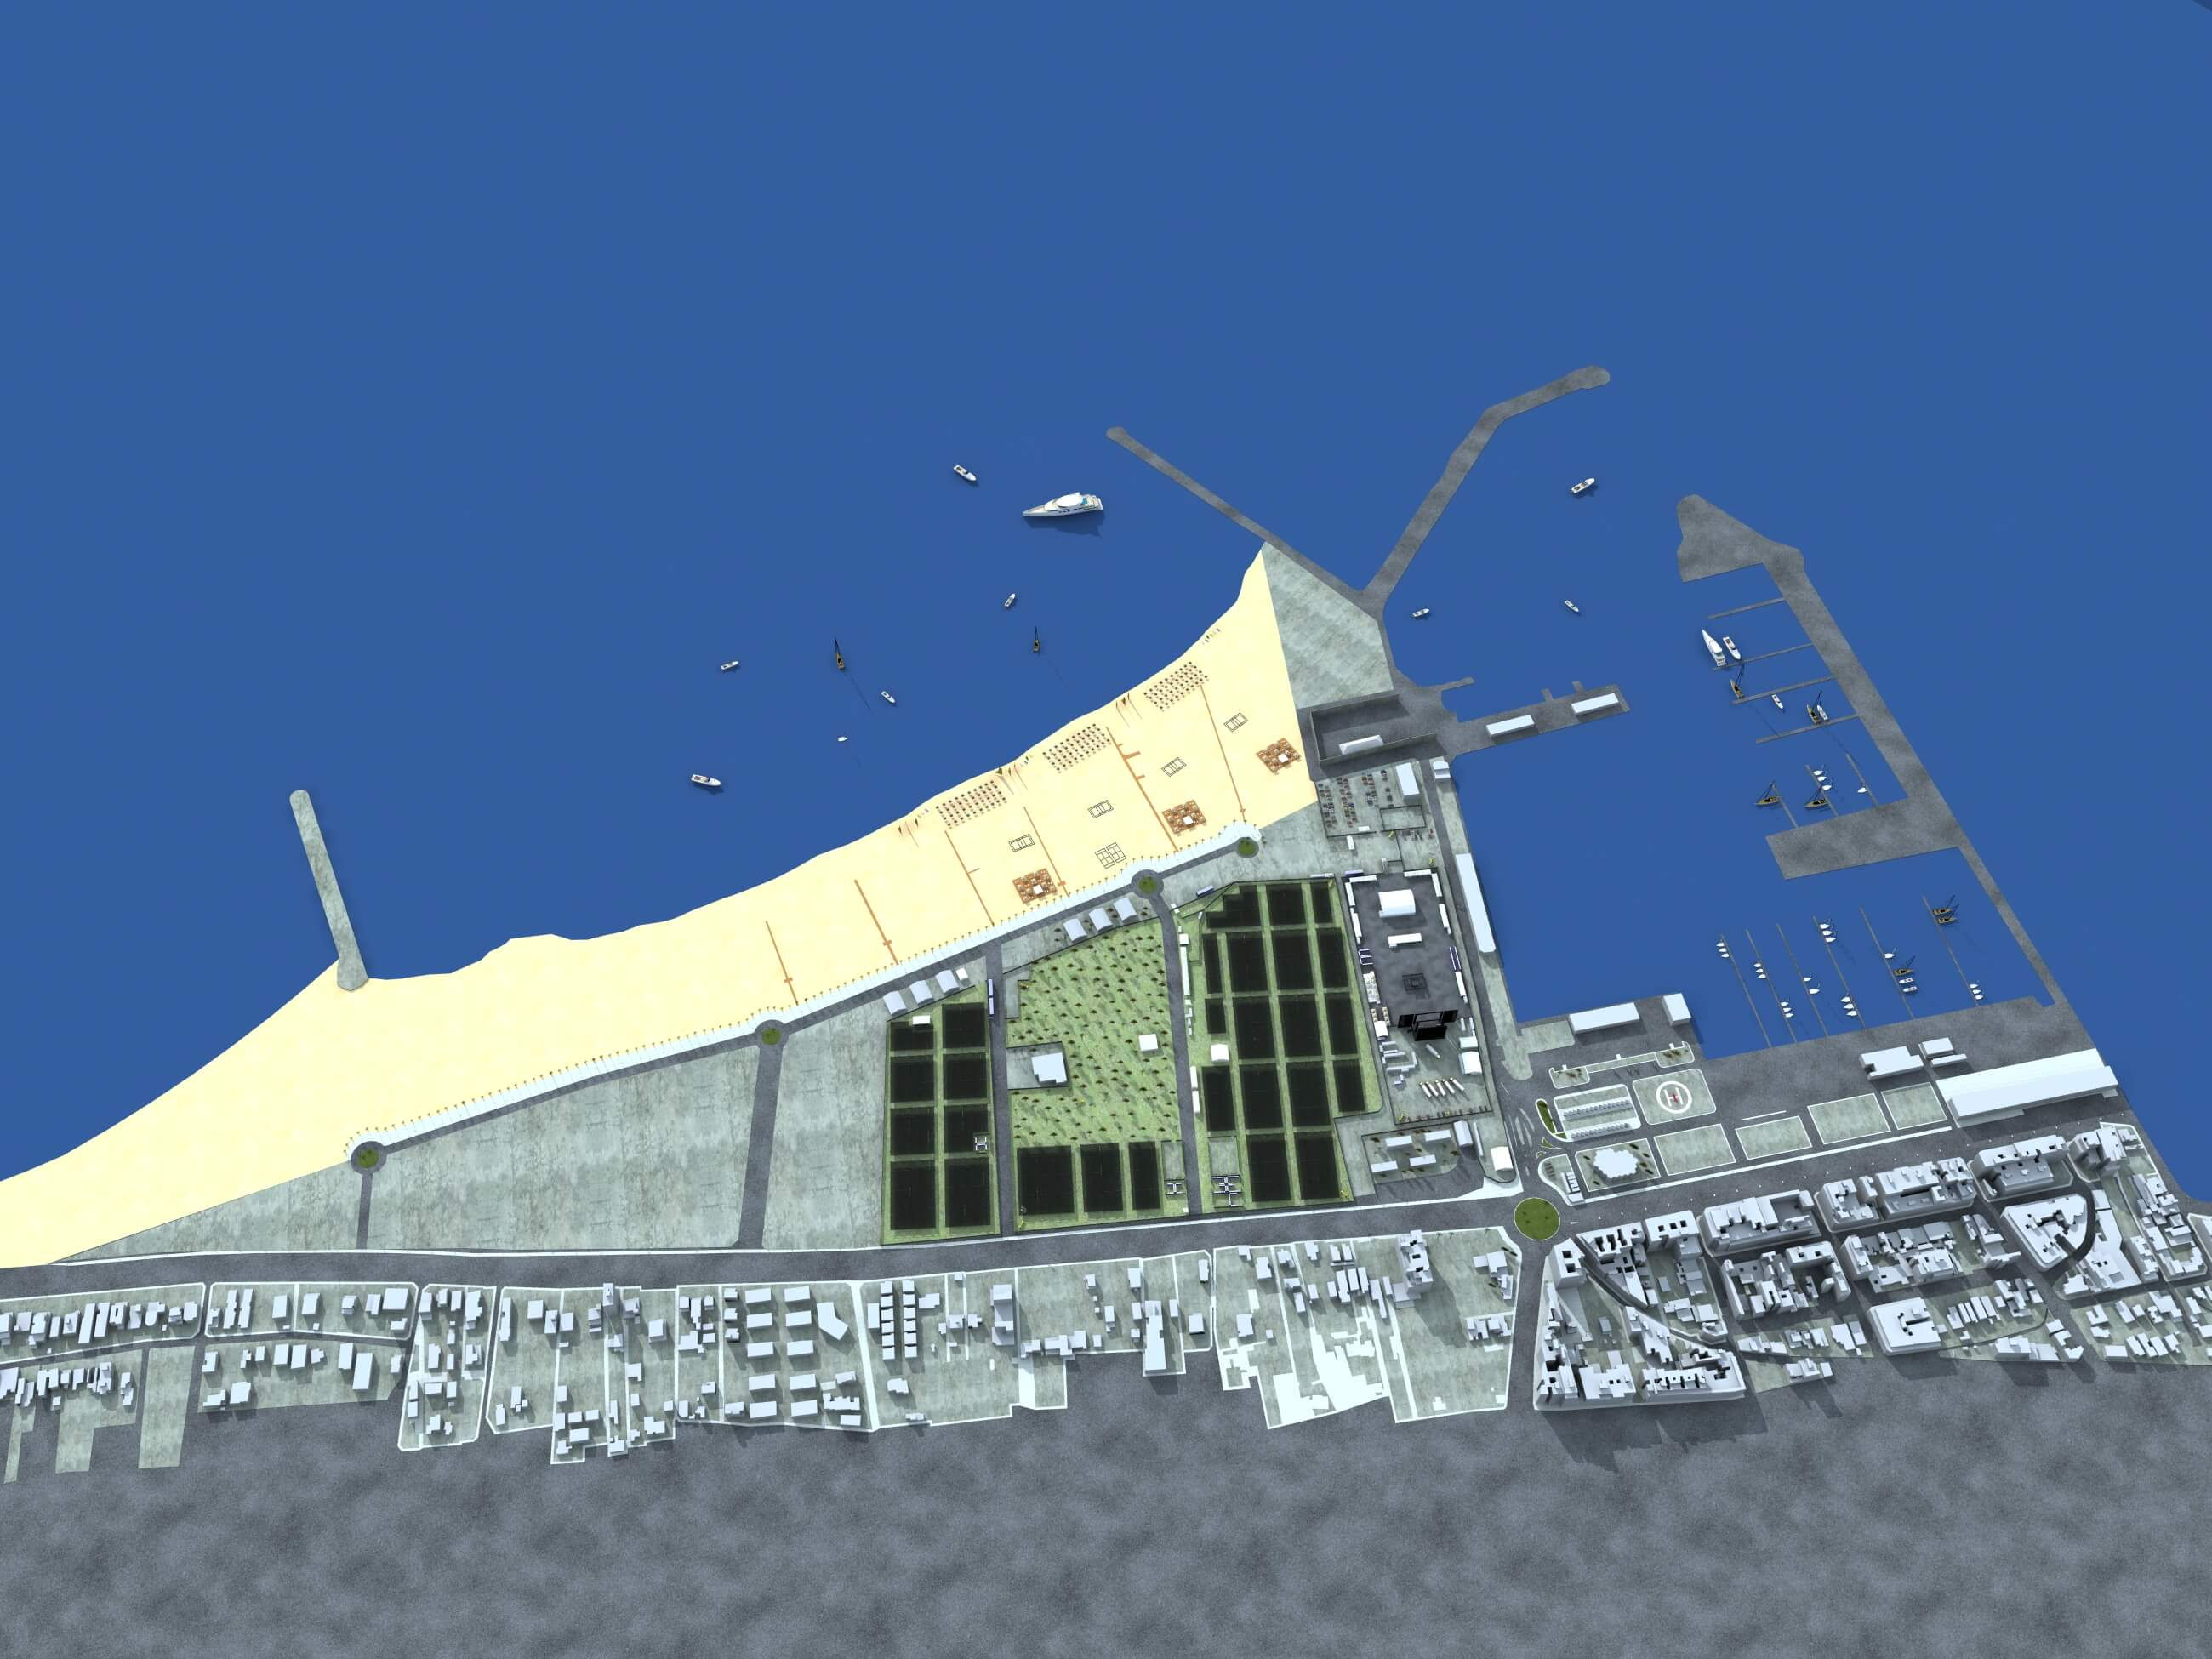 arkitech-categoria-urbanismo-8